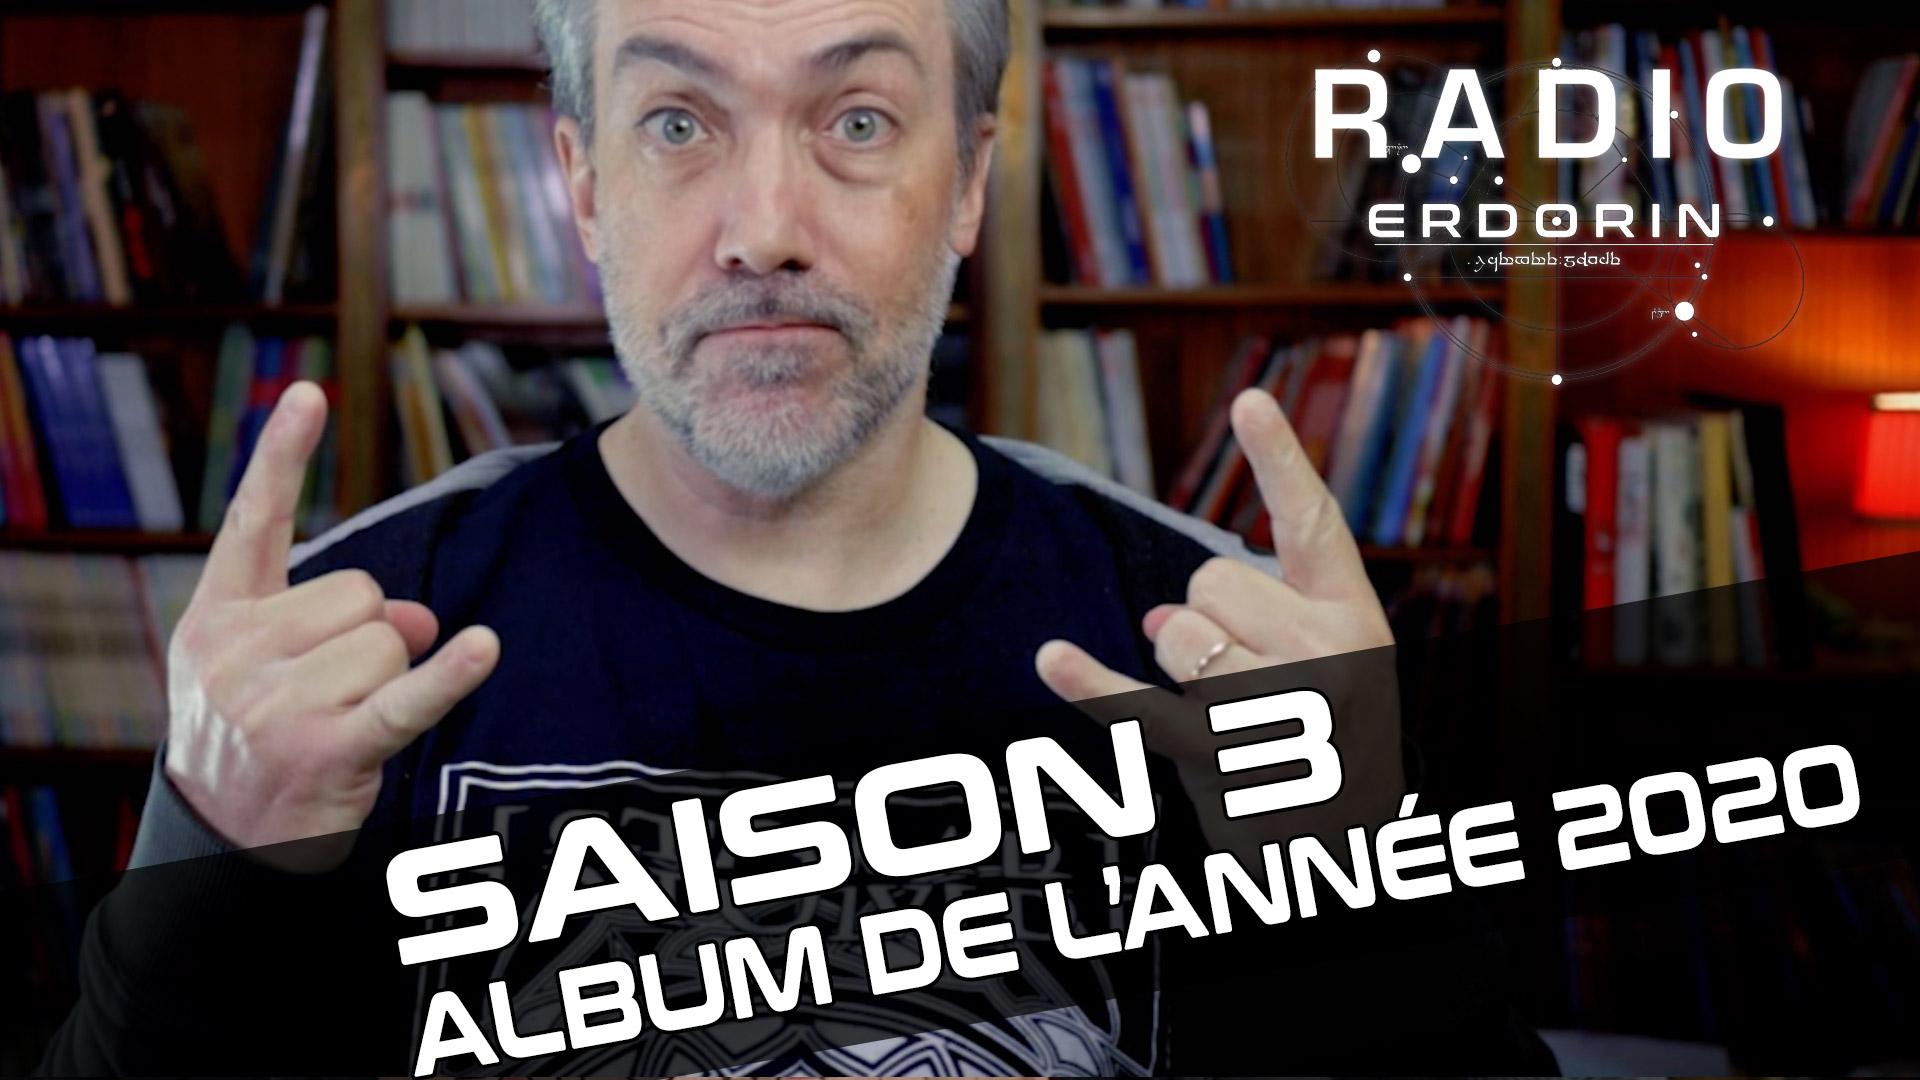 Radio-Erdorin S3HS2 - Album de l'année 2020